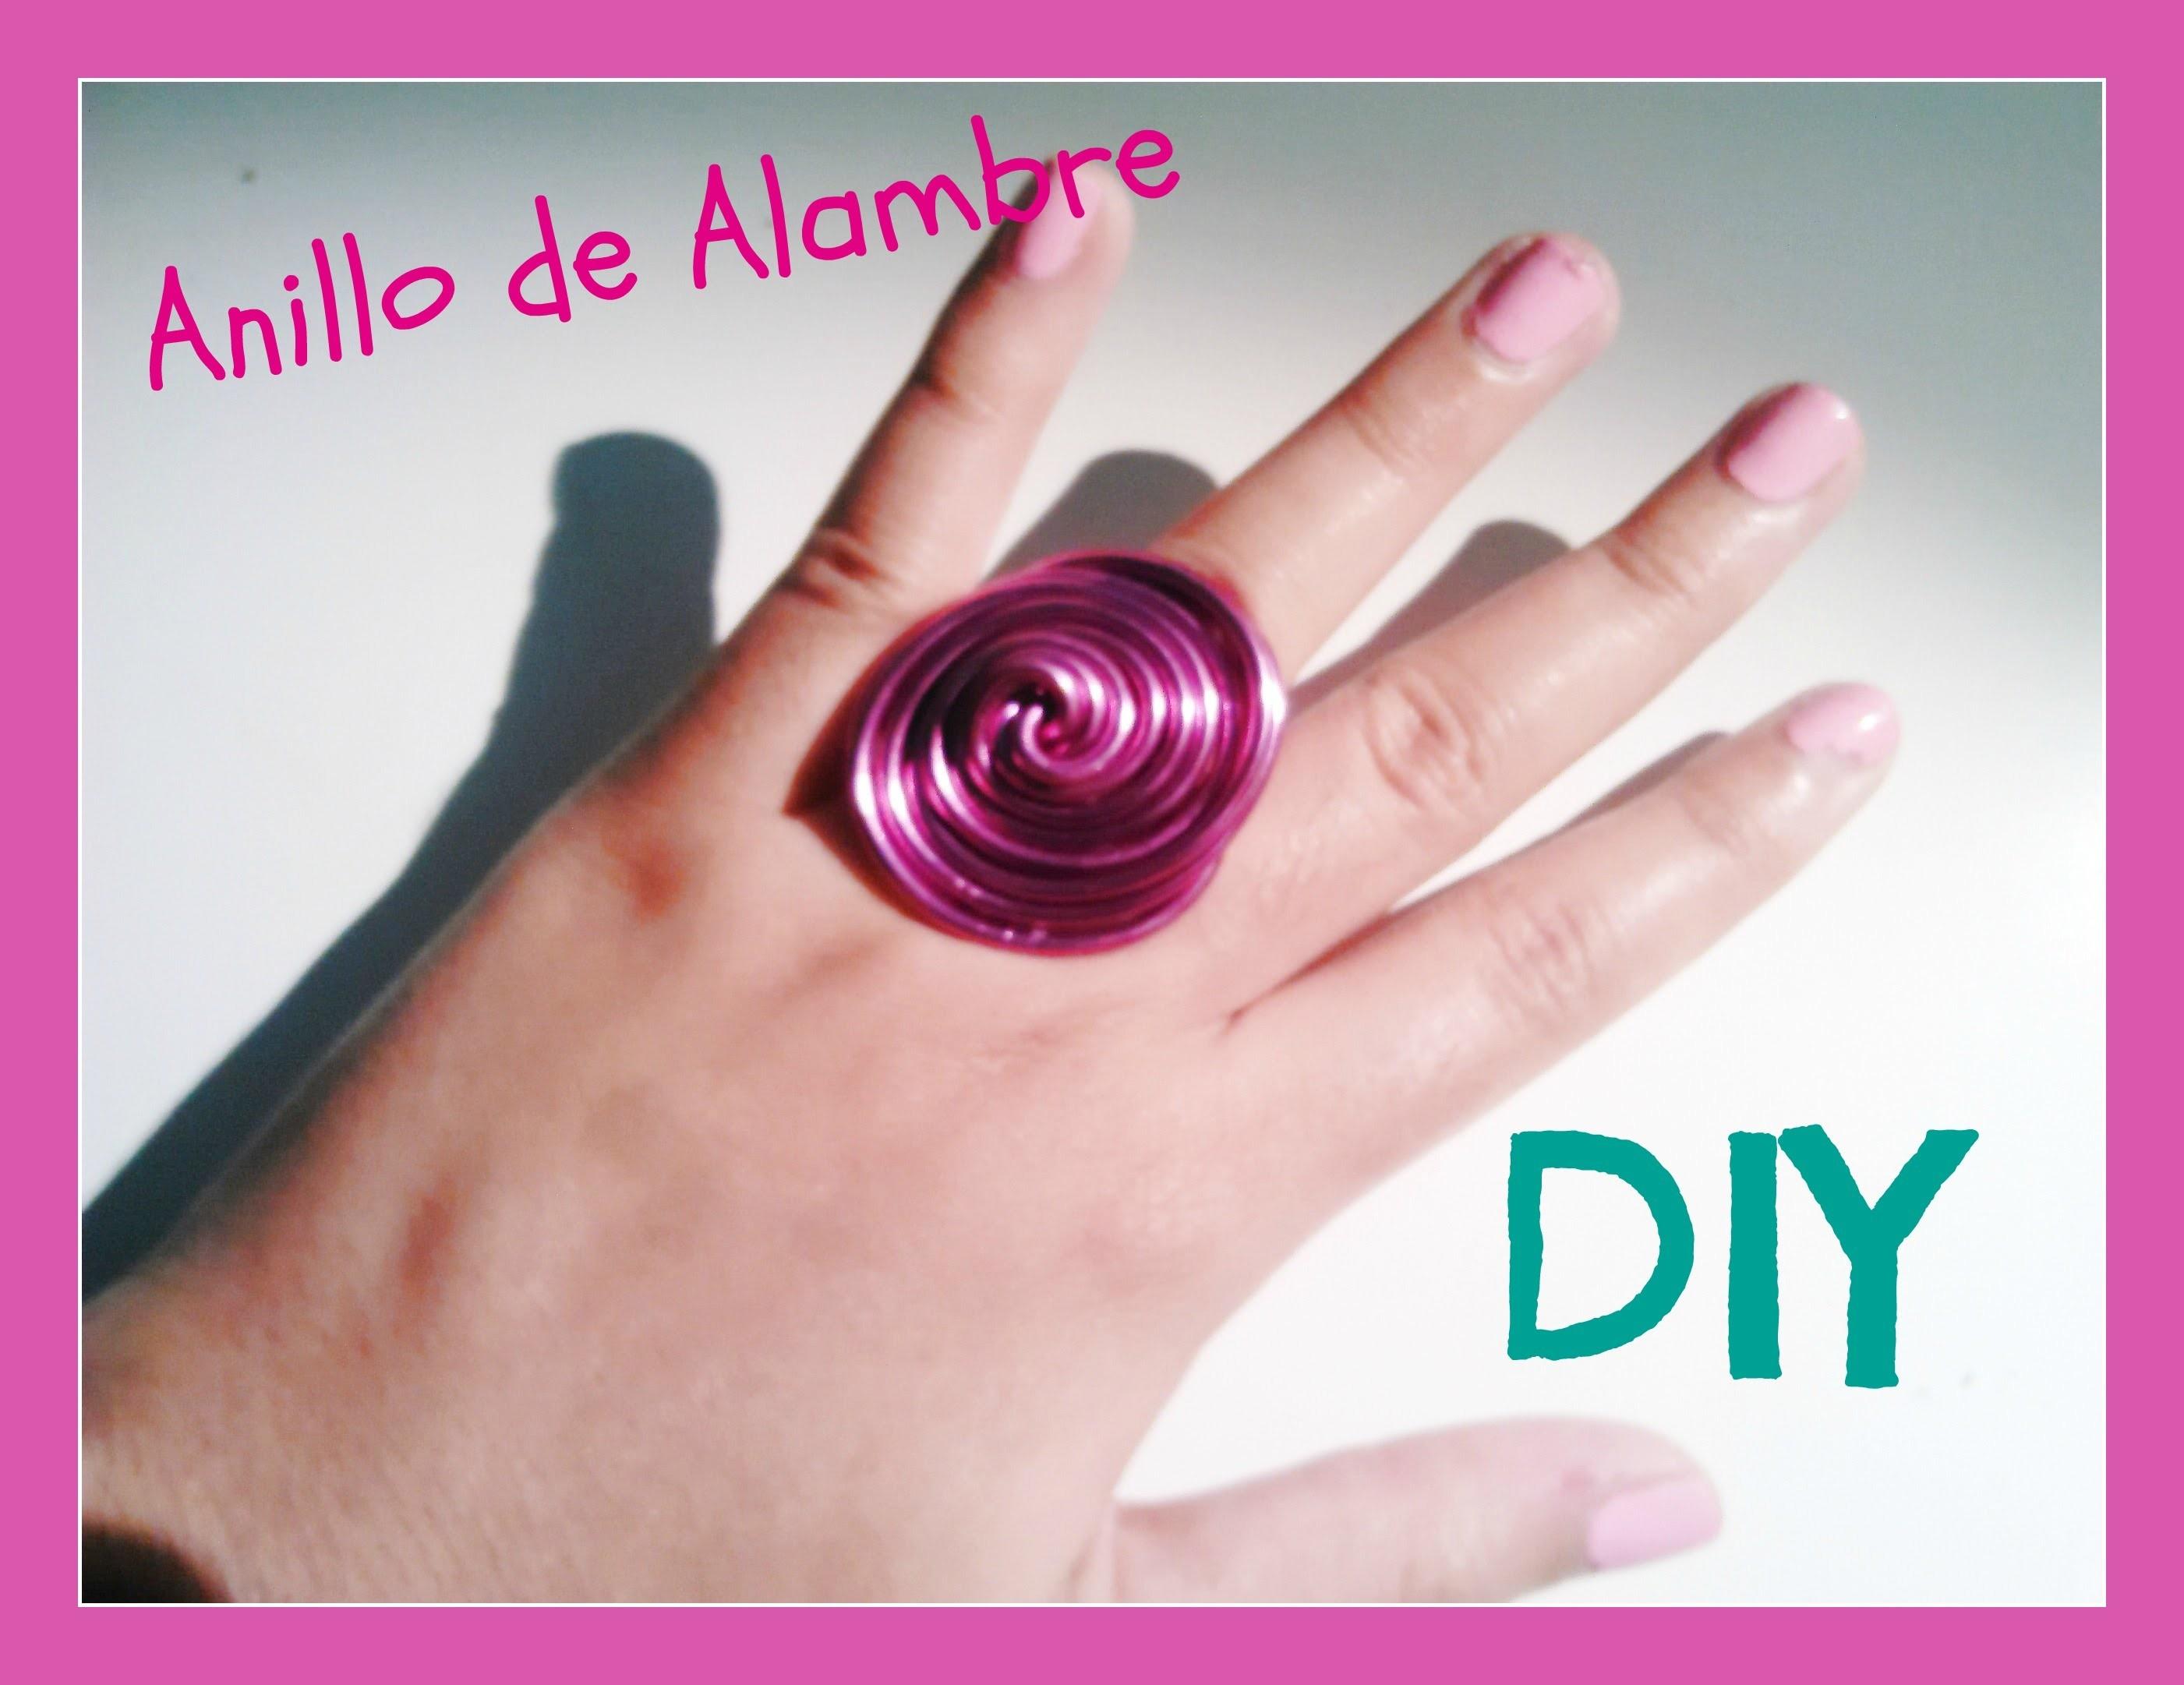 DIY: Anillo de alambre en forma de espiral